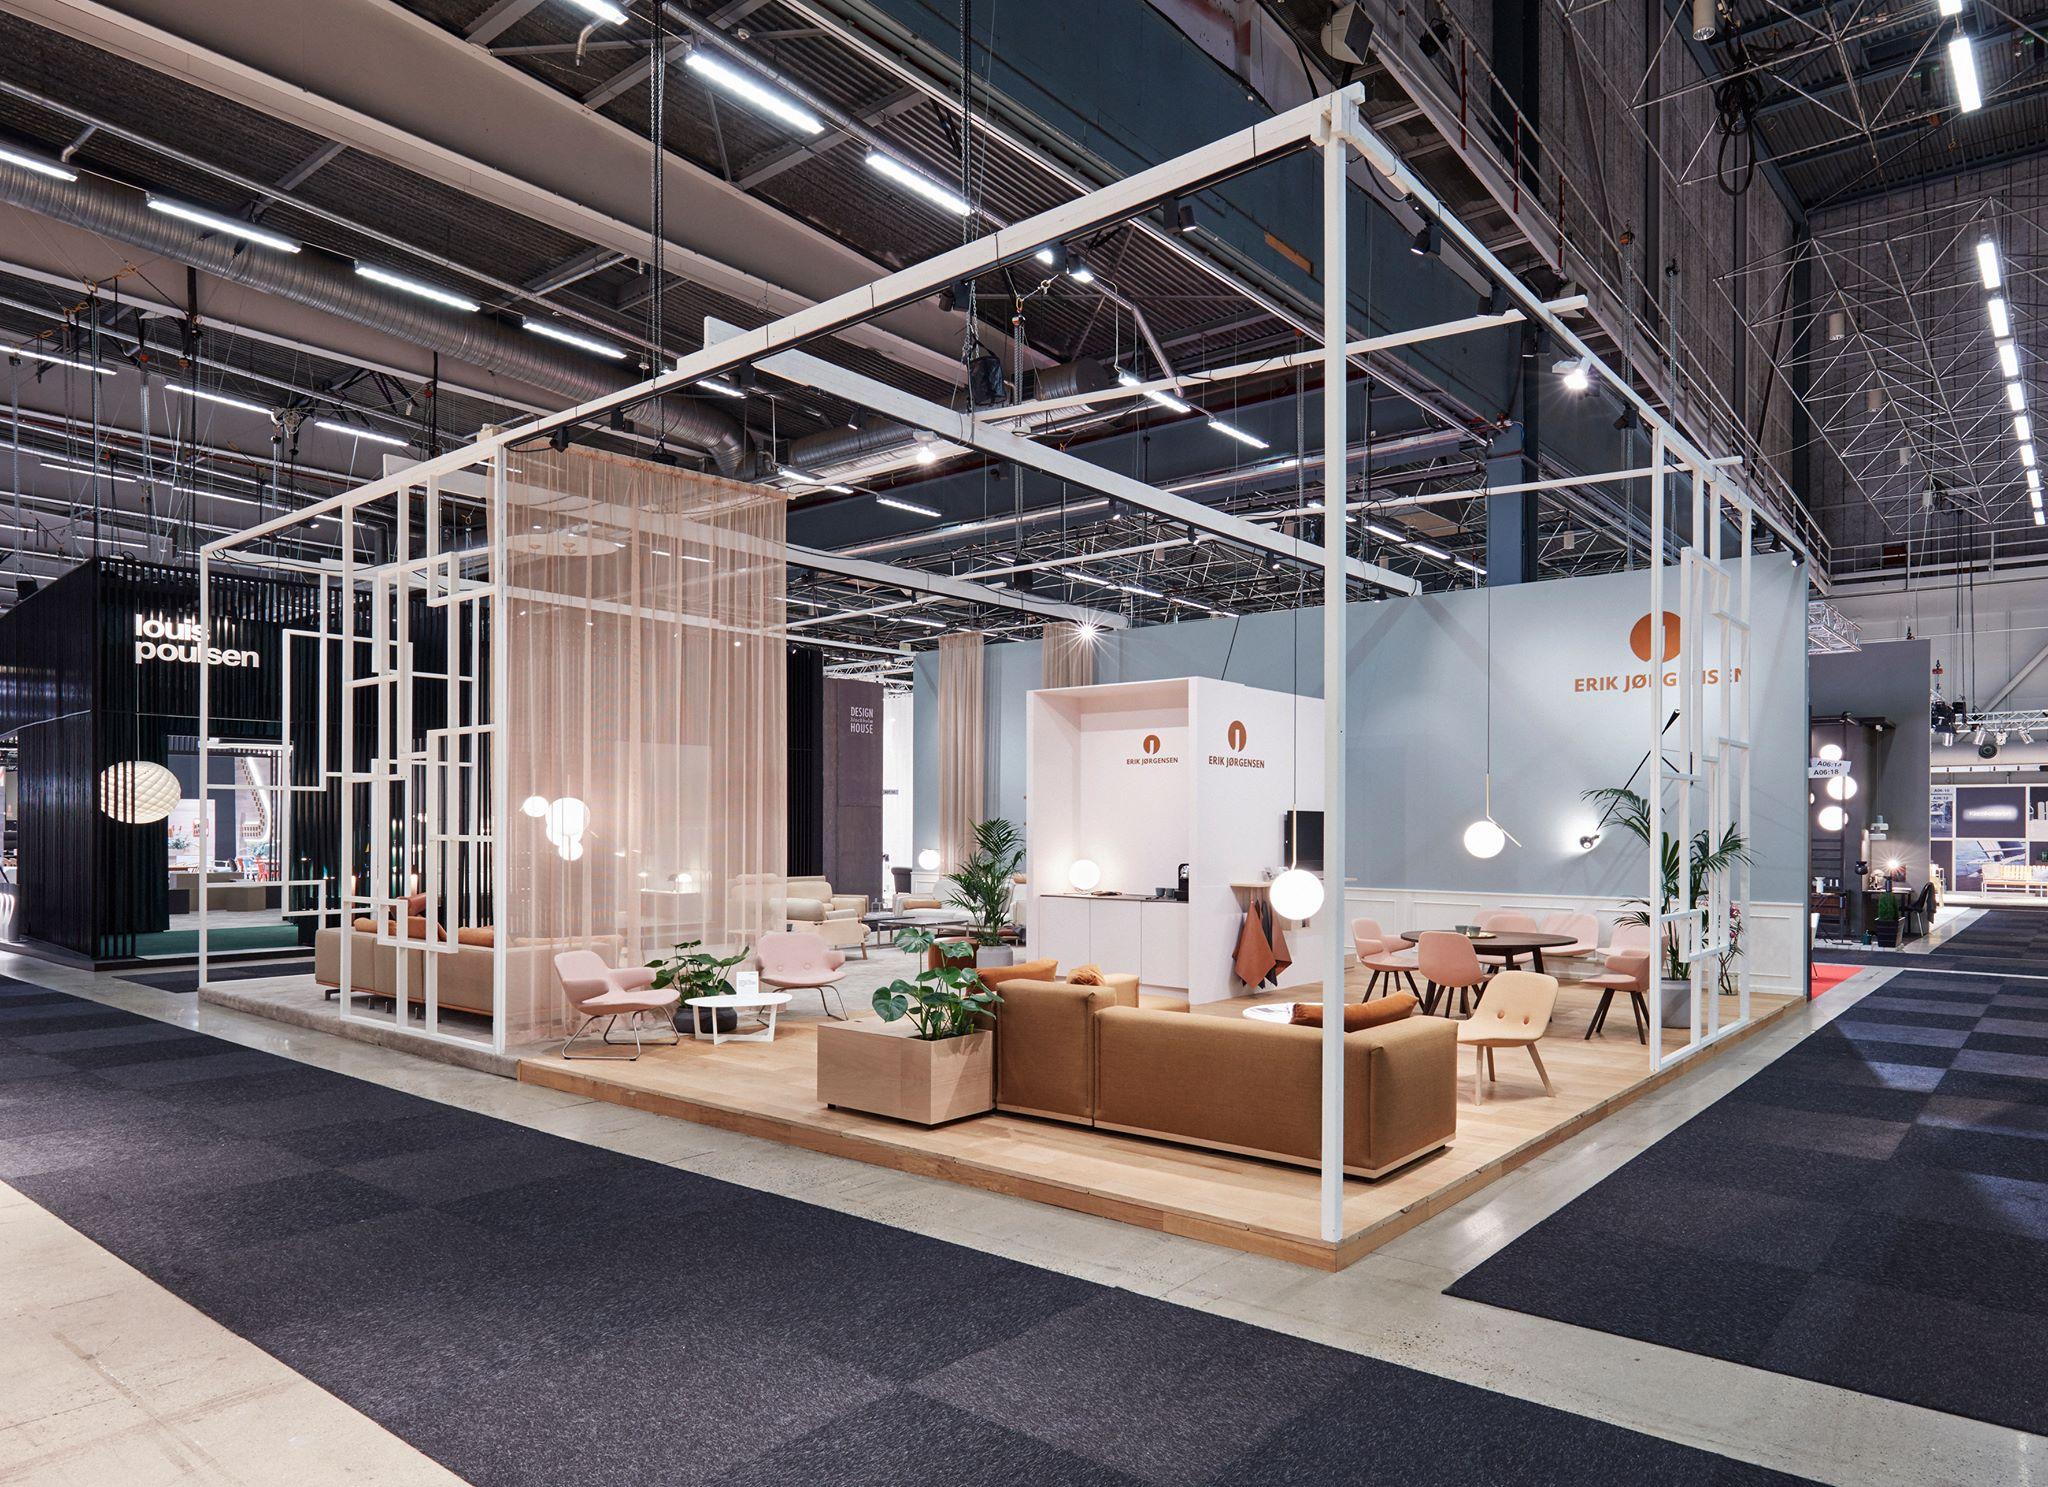 StudioGabrielle-Stockholm-Furniture-Fair-2017-Erik-Joergensen-studiogabrielle.co.uk